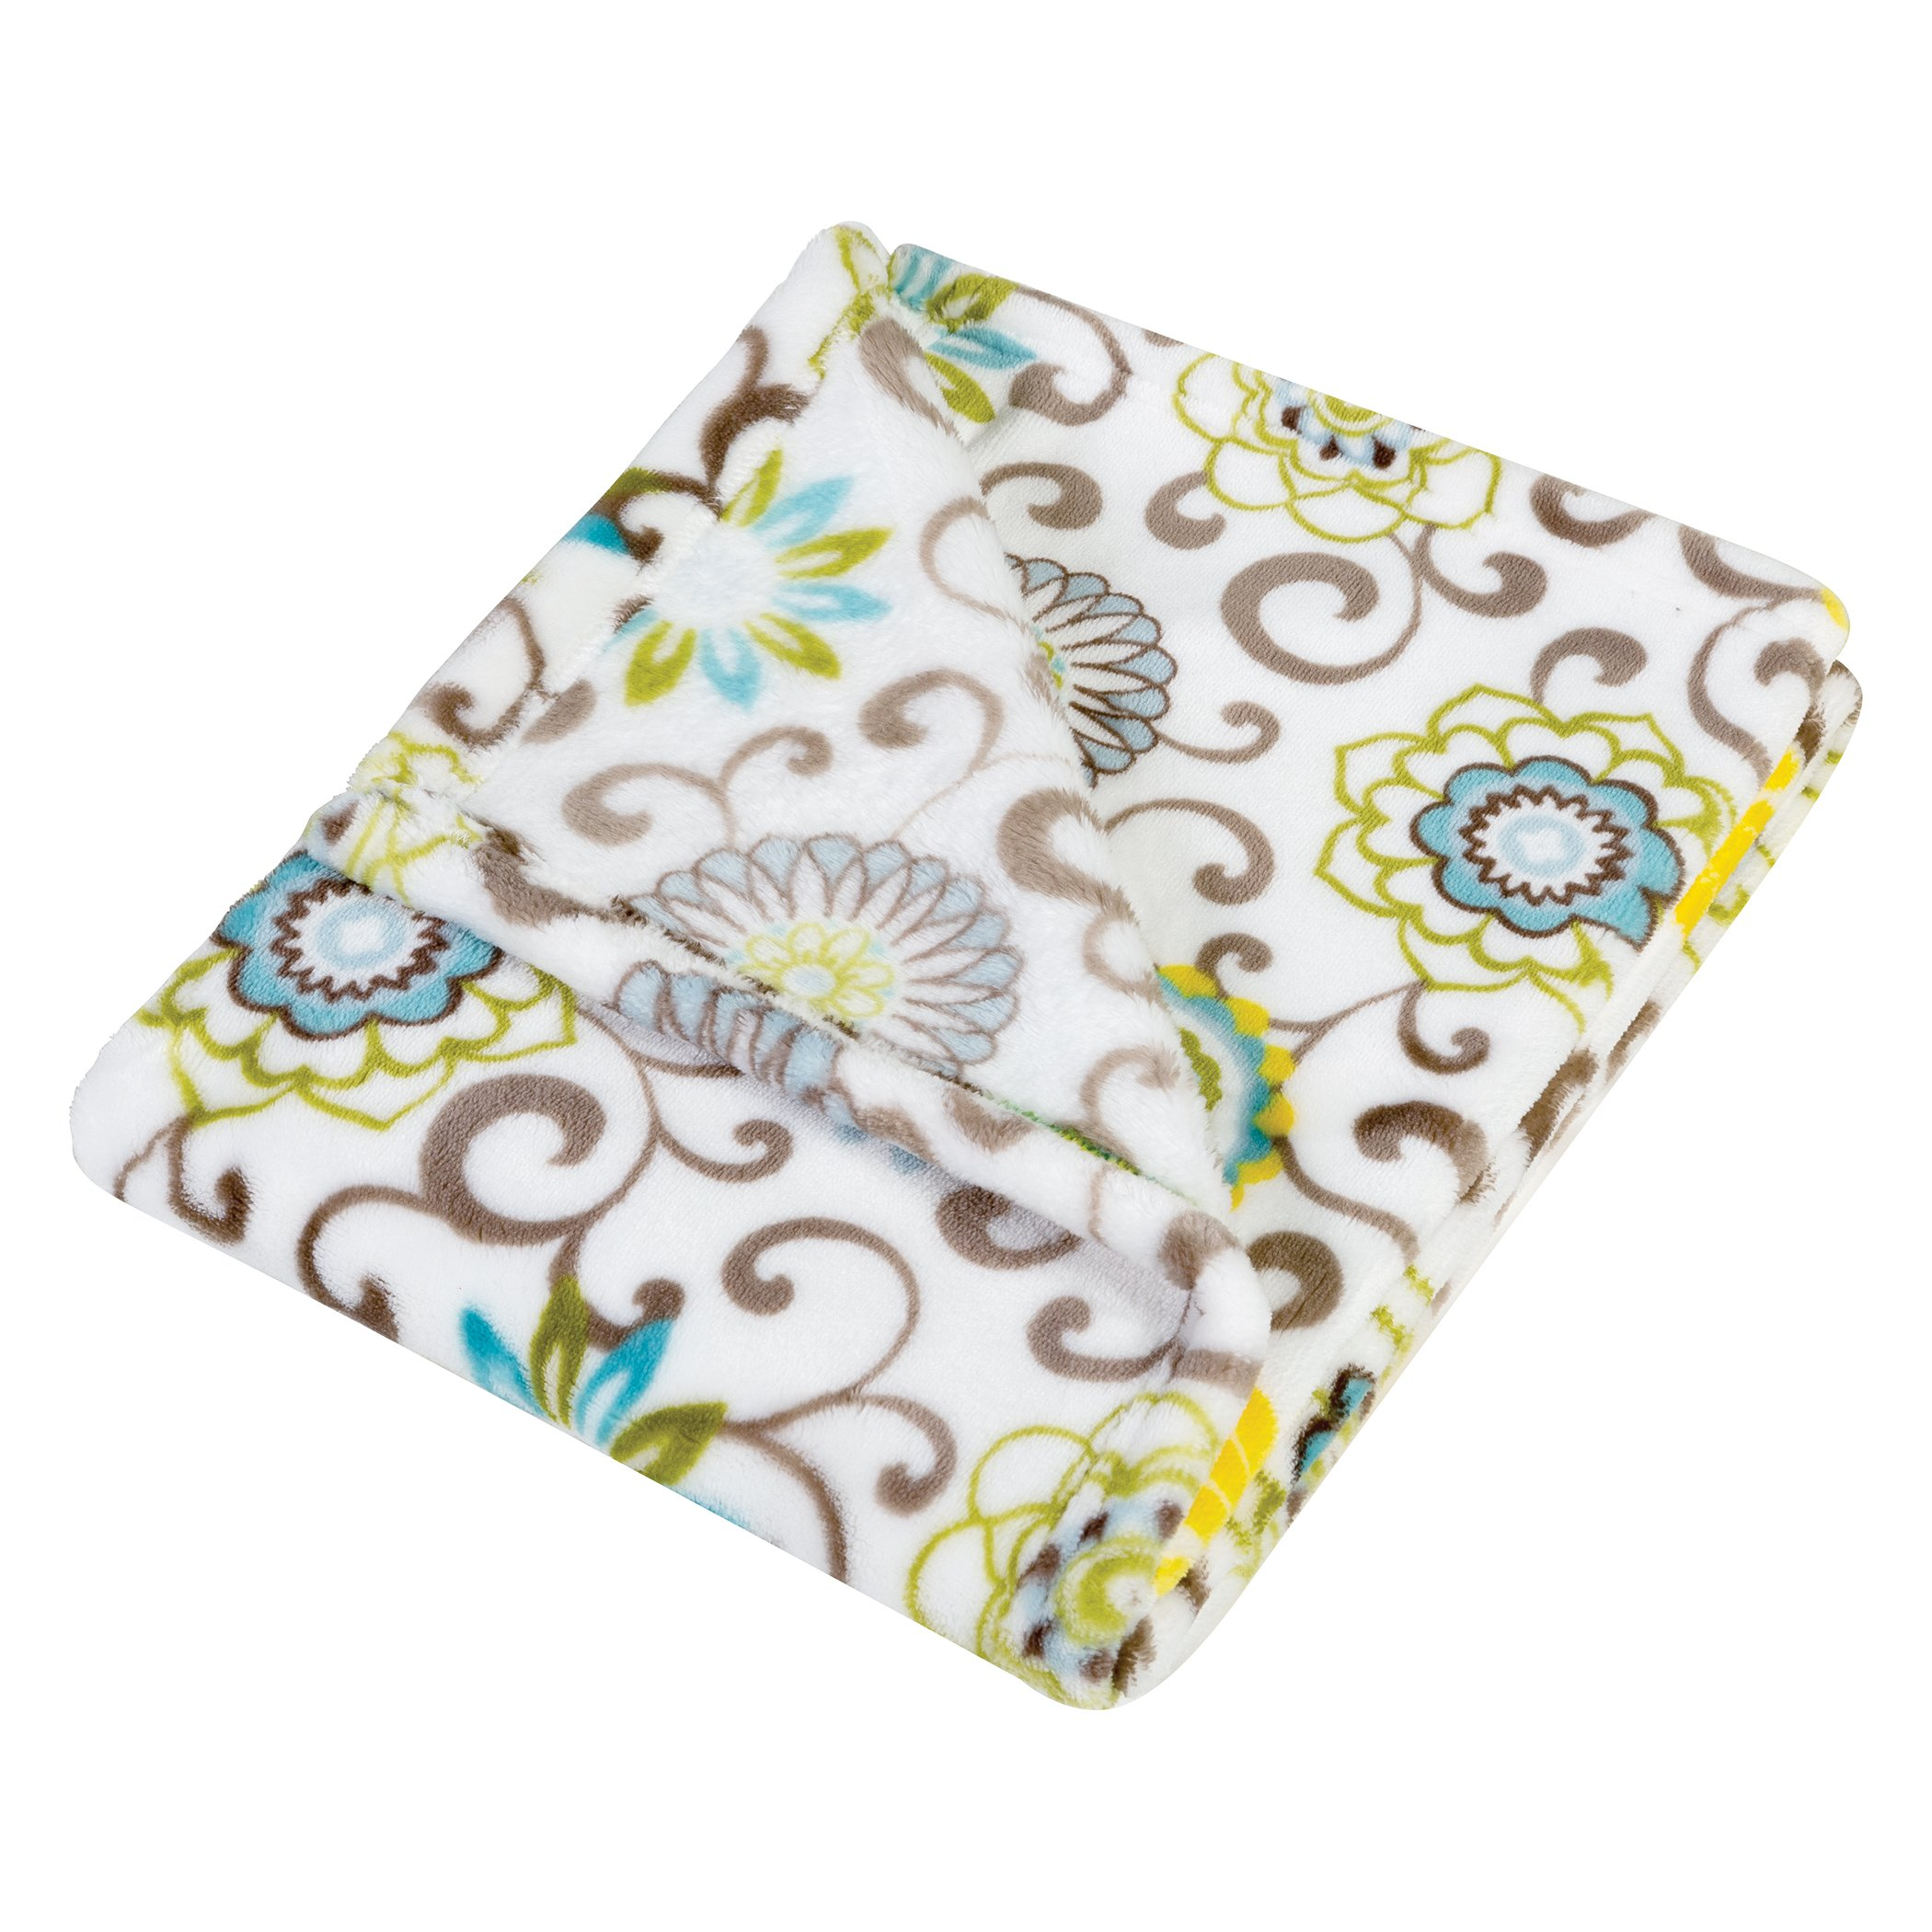 Trend Lab Plush Baby Blanket, Multi Waverly Pom Pom Spa